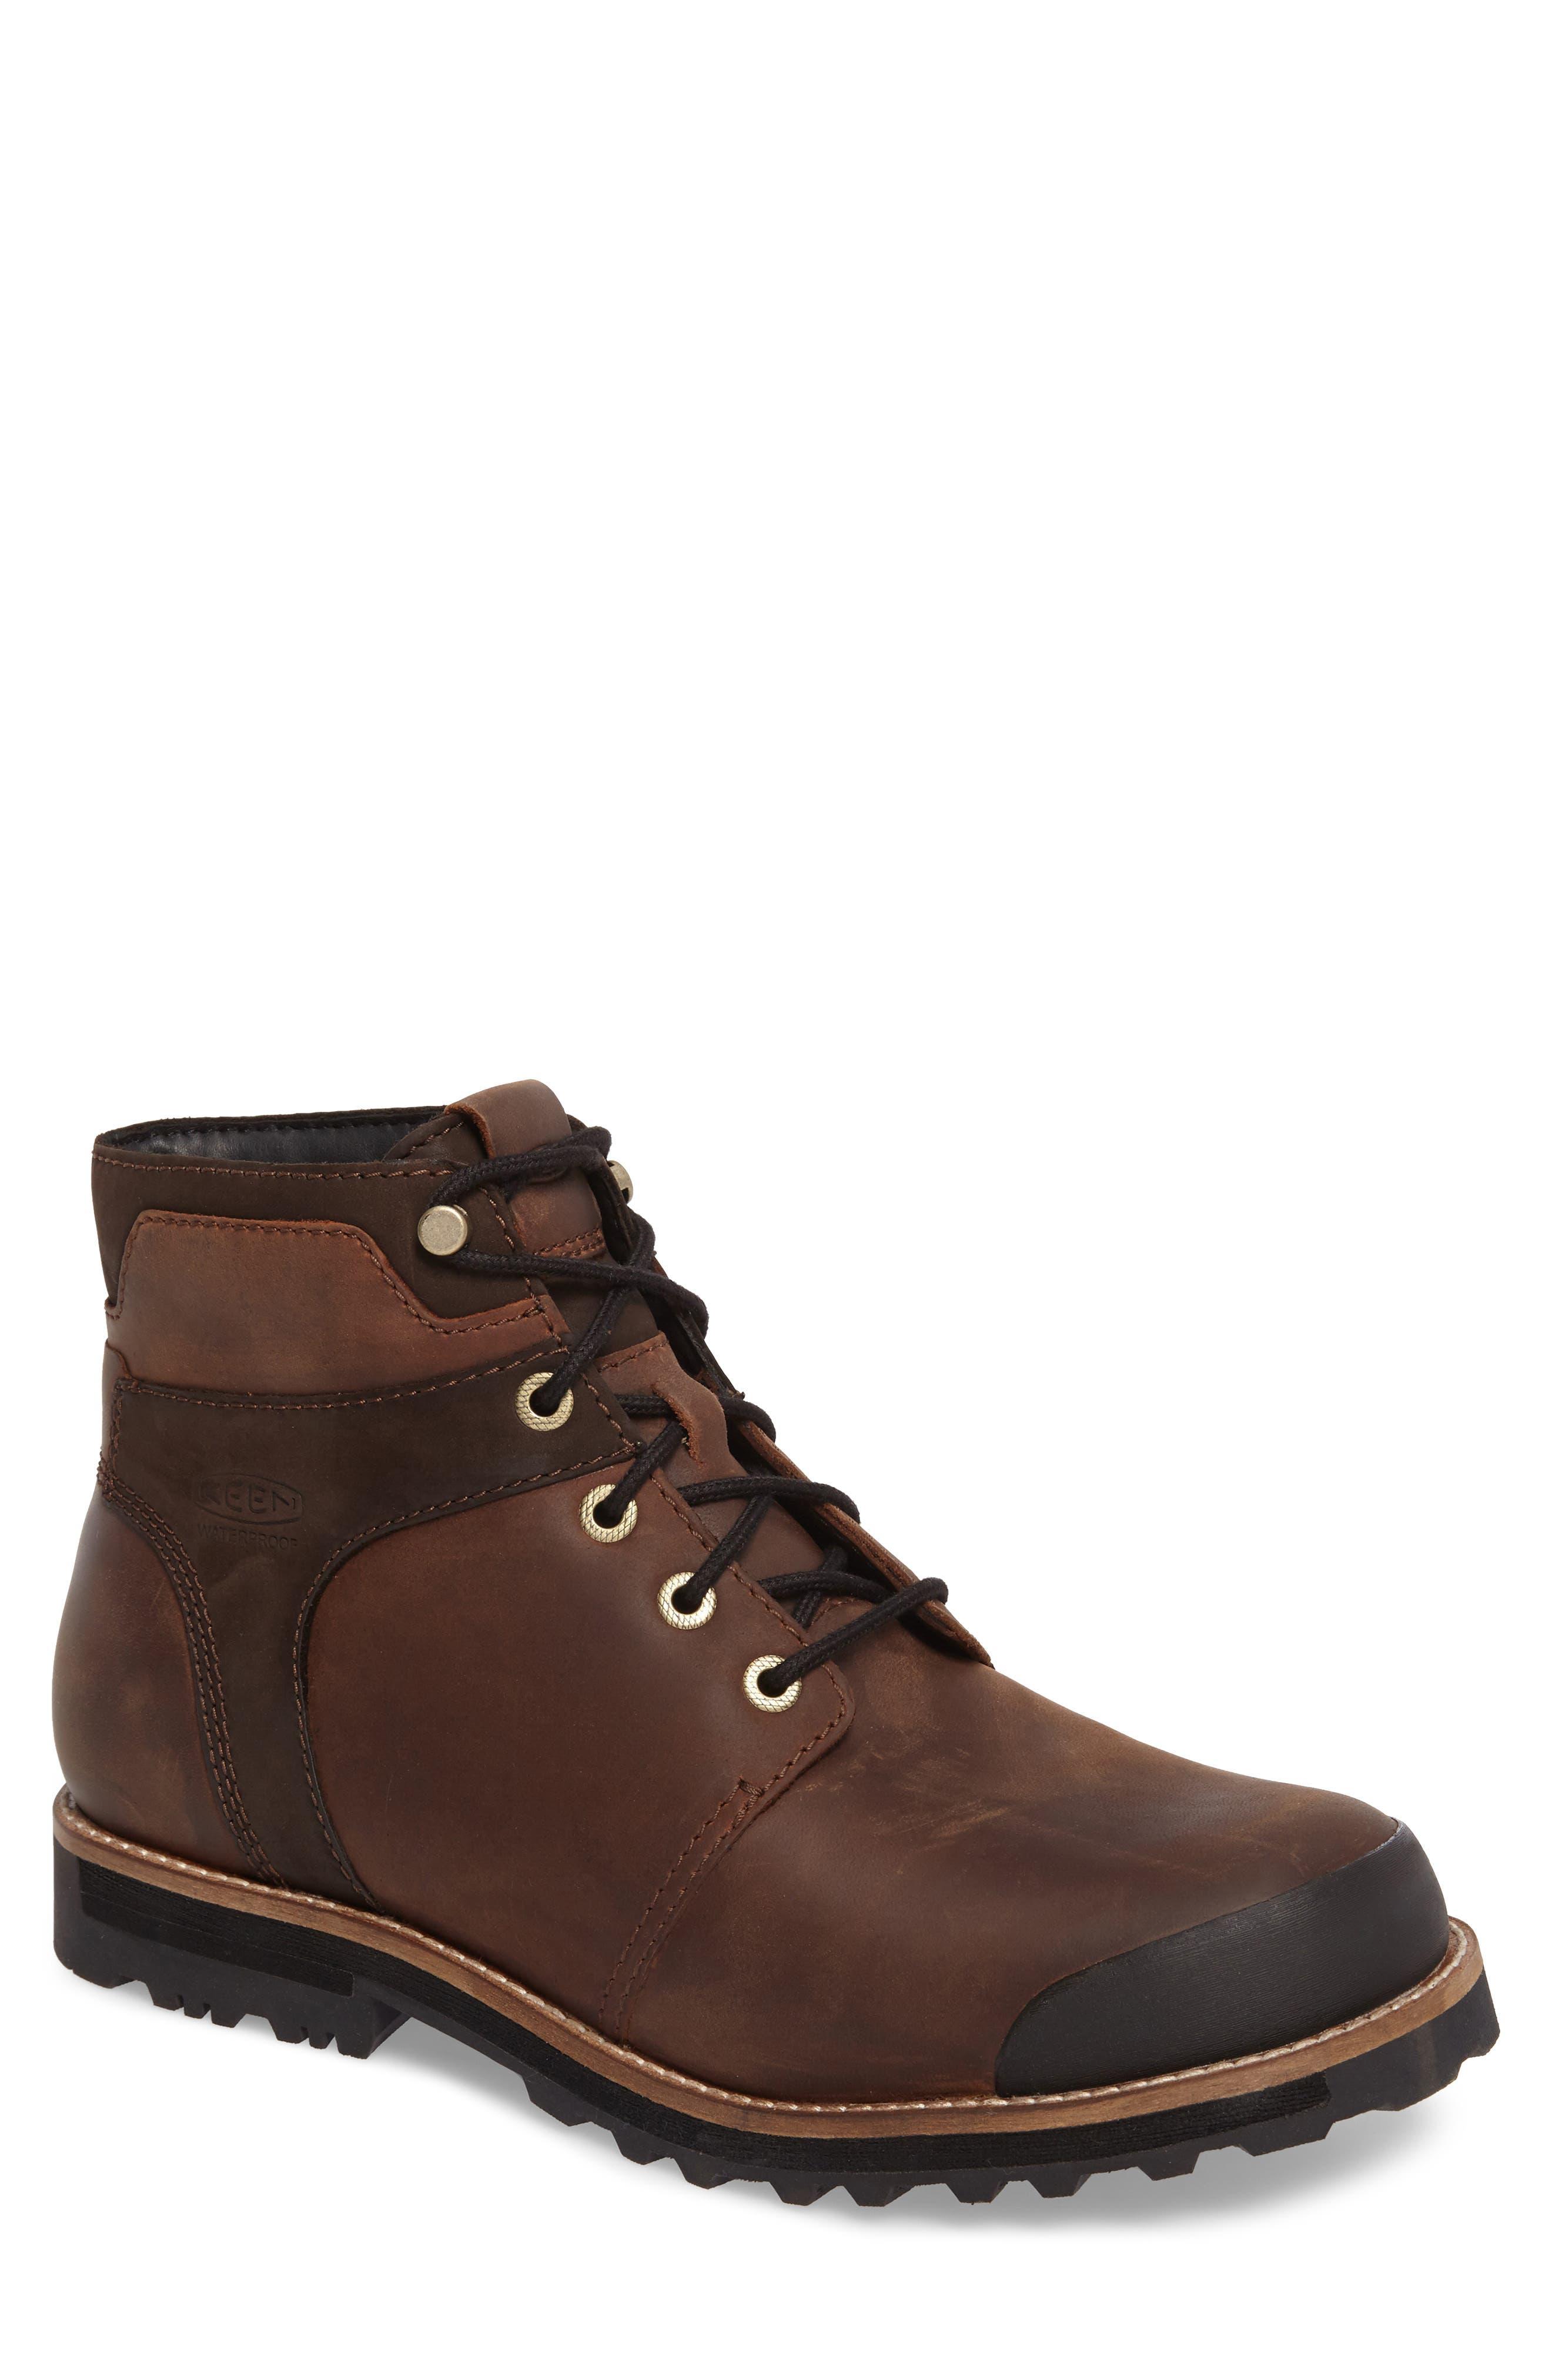 e3847d6e9 Keen The Rocker Waterproof Plain Toe Boot